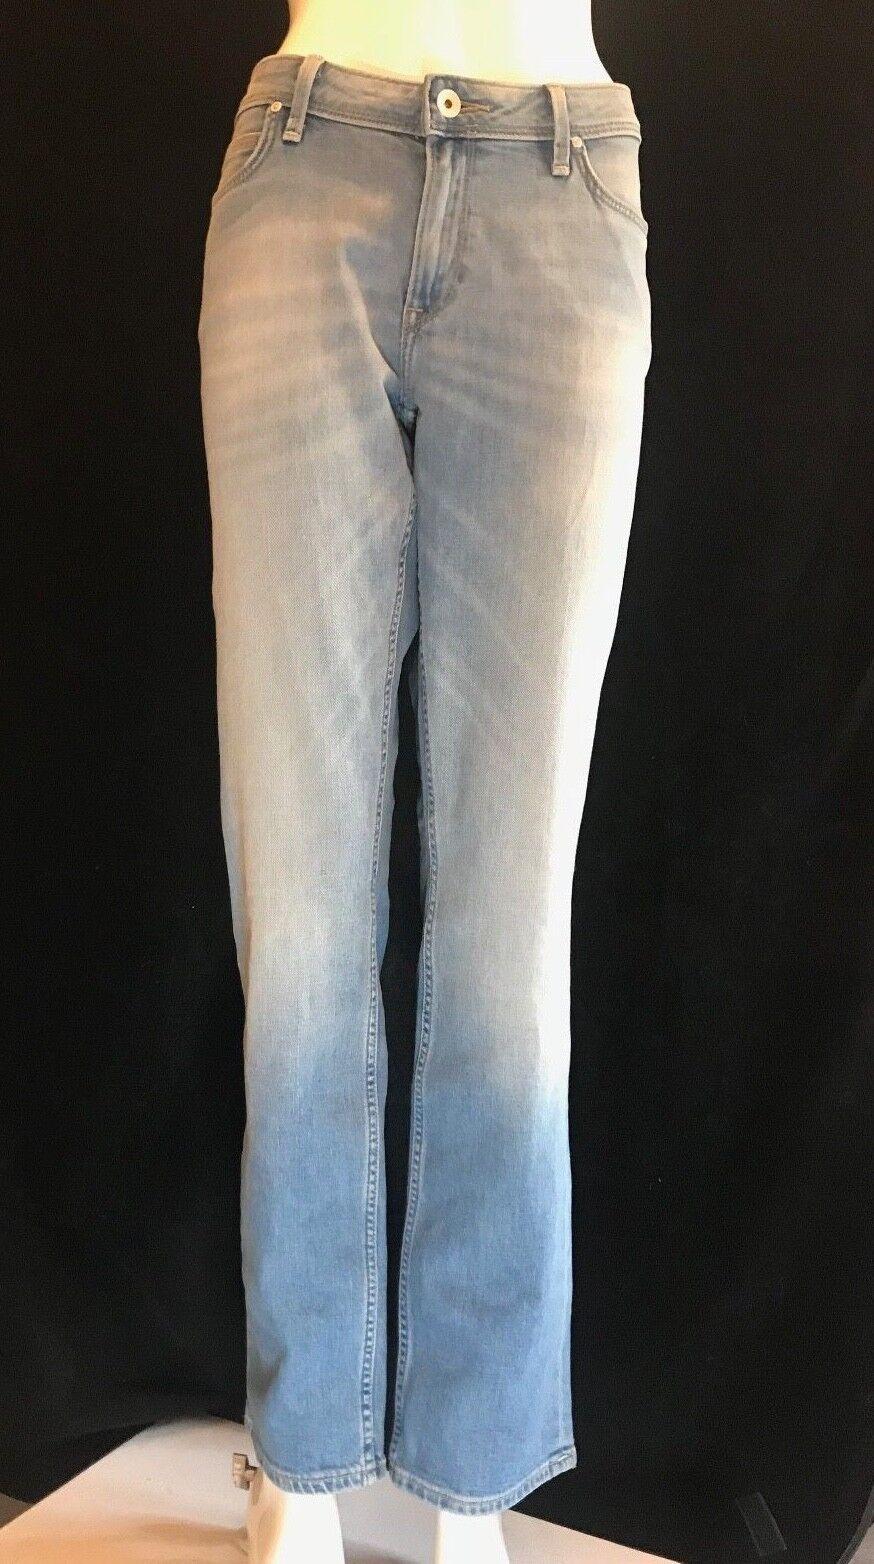 BNWT LEE Ladies Emlyn Straight Leg Jeans in Beach bluee W 32  L 33  RRP